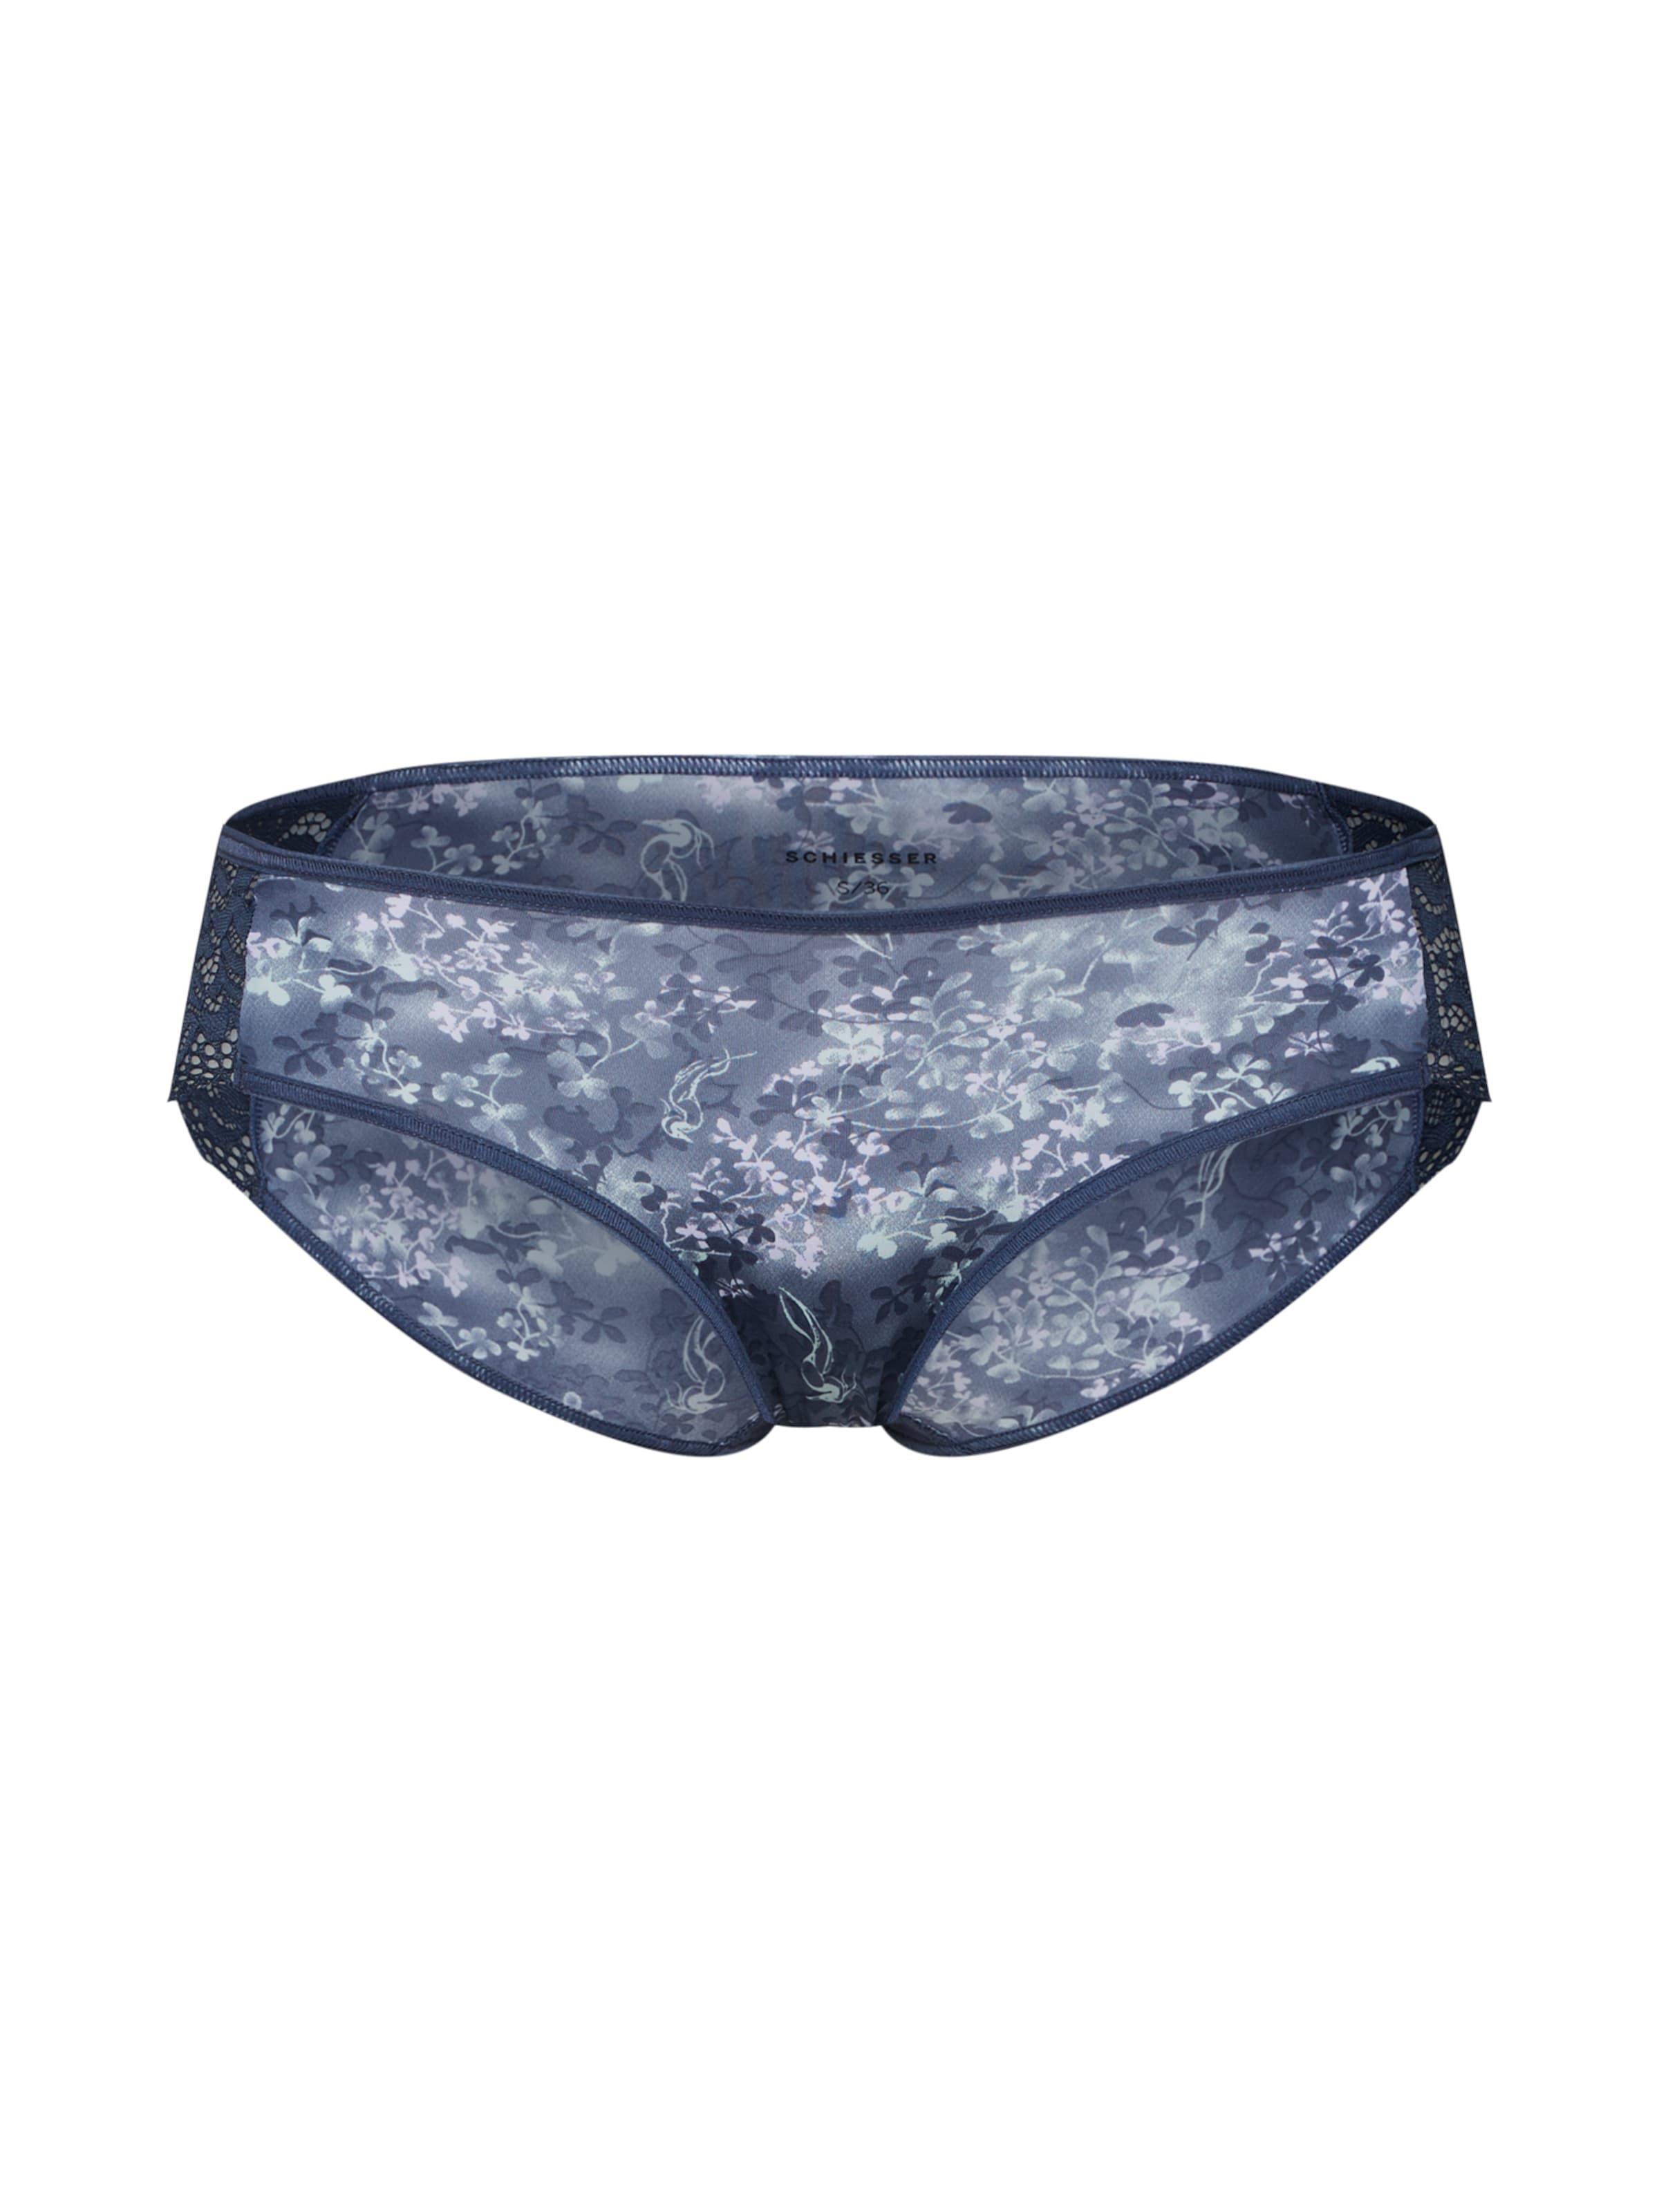 Culotte Bleu Bleu Schiesser En Foncé Culotte Schiesser Bleu Schiesser En En Foncé Culotte FJcTl3uK1